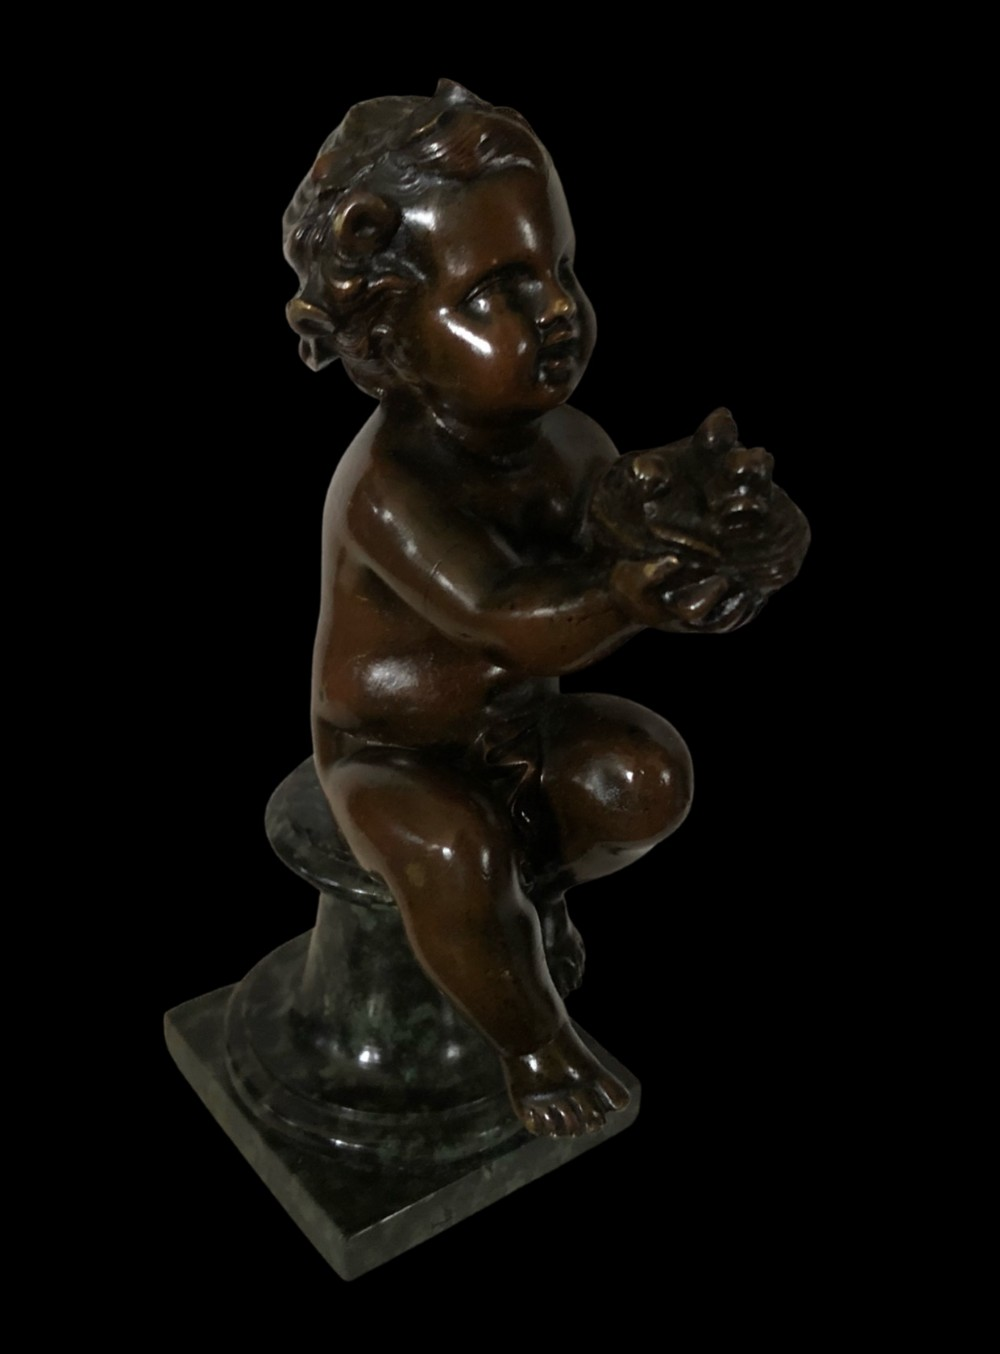 19th century bronze of seated putti